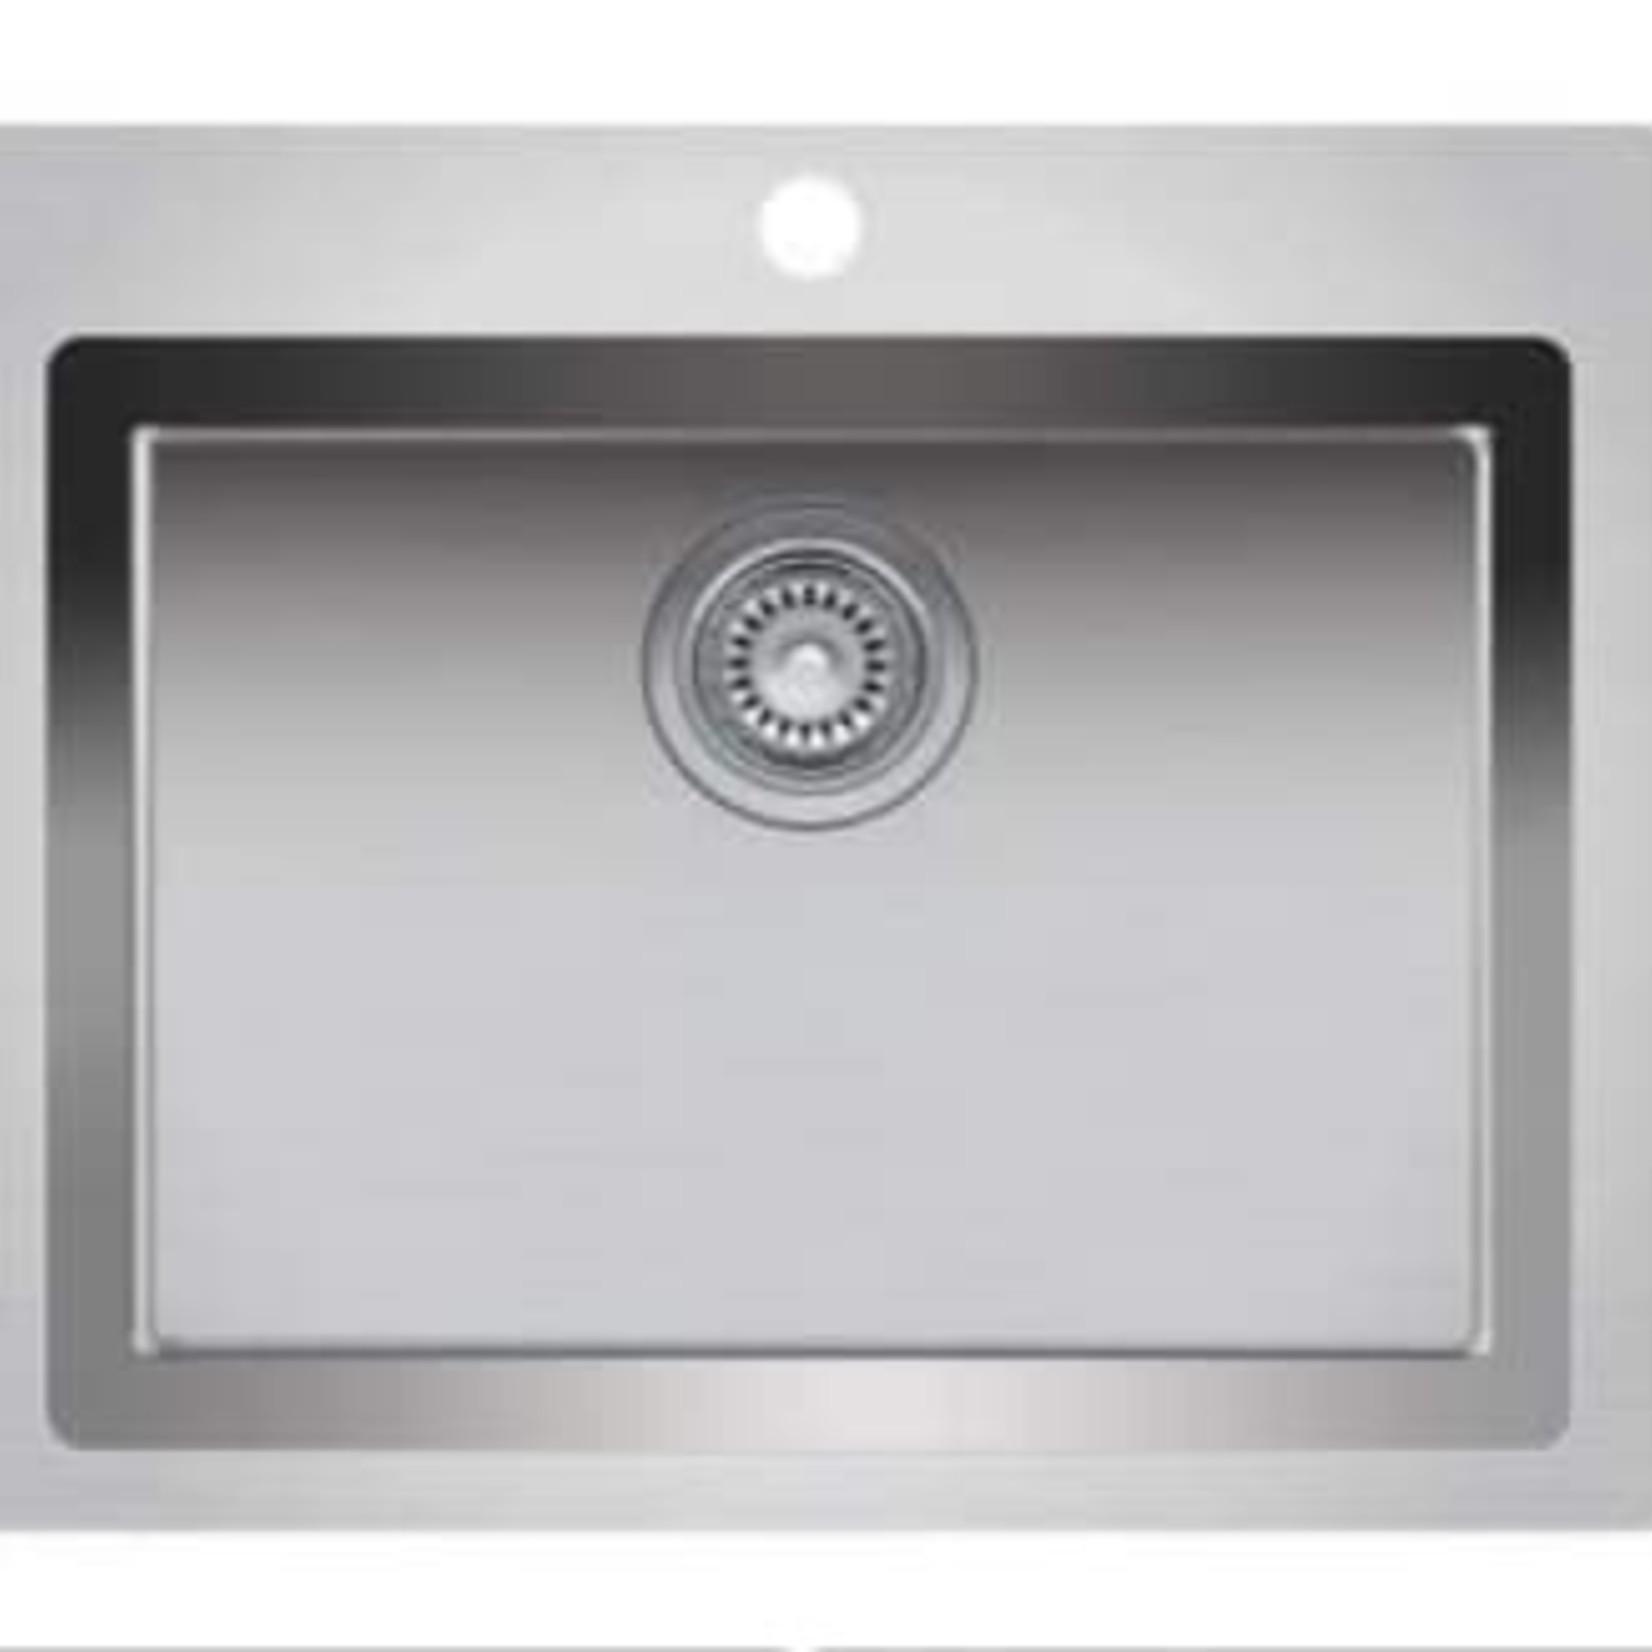 Single bowl undermount kitchen sink 207/8 'x 201/2' x 9 'Nautika ZR110